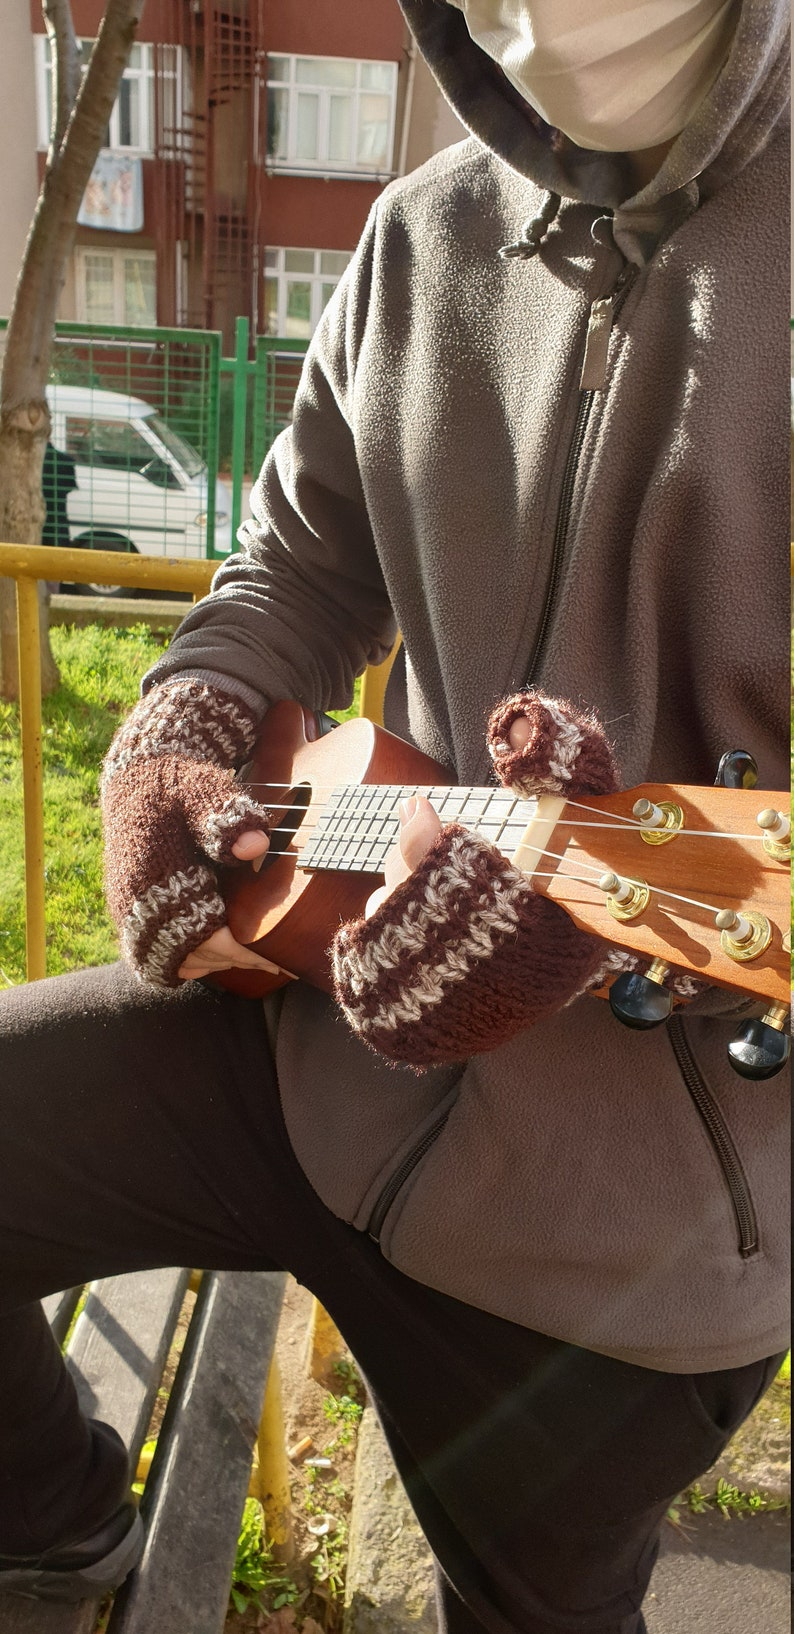 Hand Knitting Men Gloves ~ Men/'s Fall Fashions ~ Winter Accessory for Men ~ Women/'s Fall Fashion